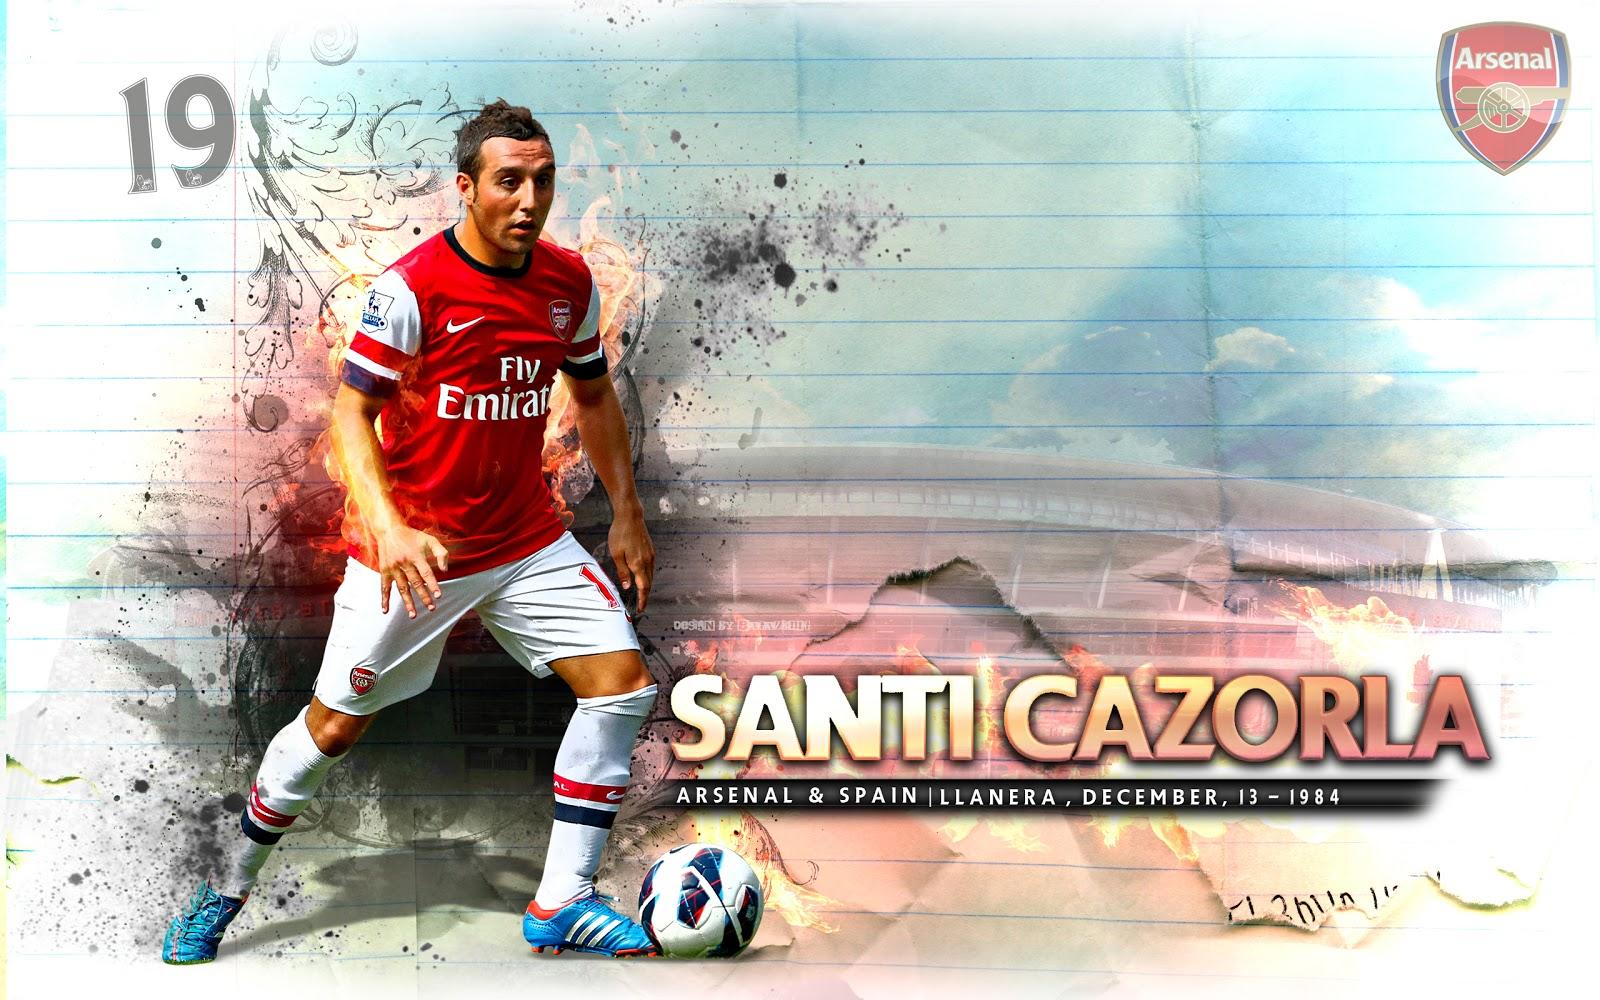 Santi cazorla clipart clip transparent stock Player Football Santi Cazorla High Definition   Wallpapers ... clip transparent stock